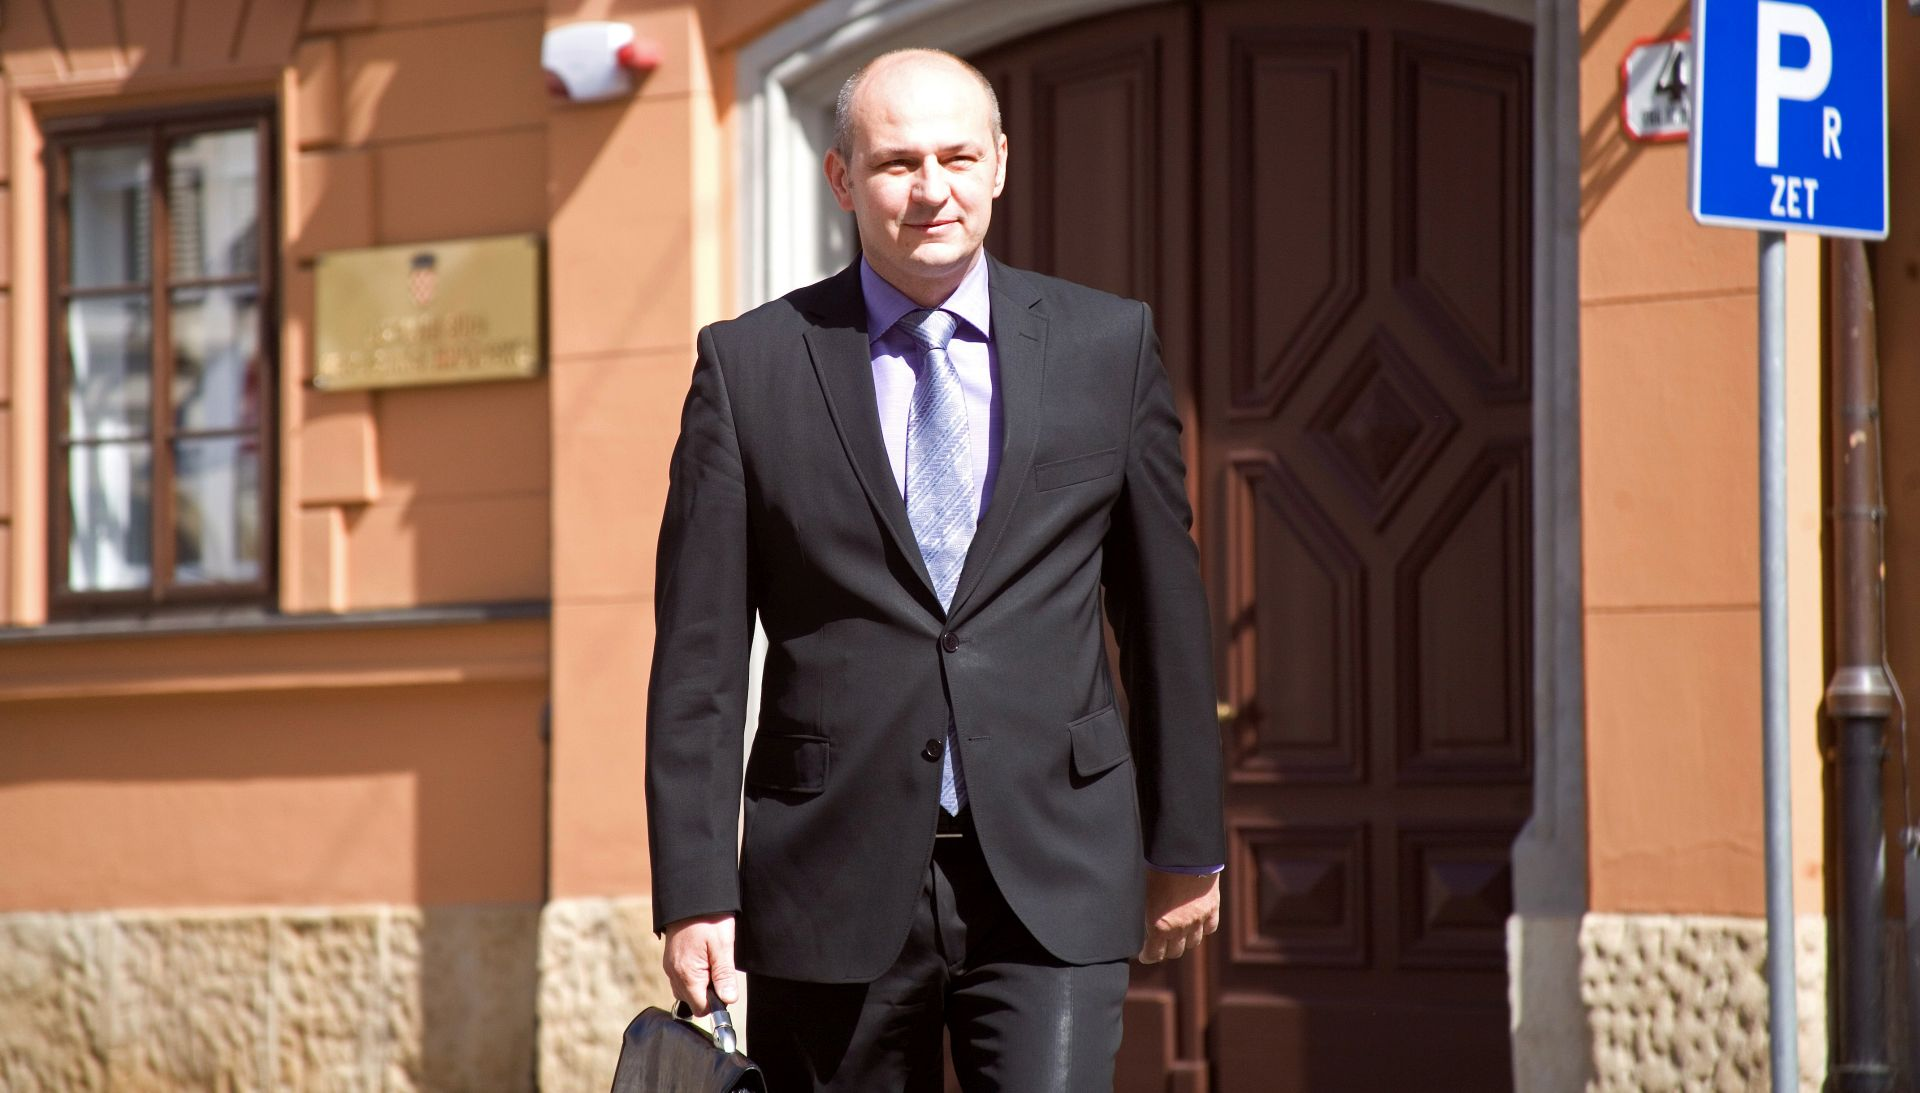 AGROKOR Kolakušić: 'Položaj Alvareza u Agrokoru je pravno nejasan'